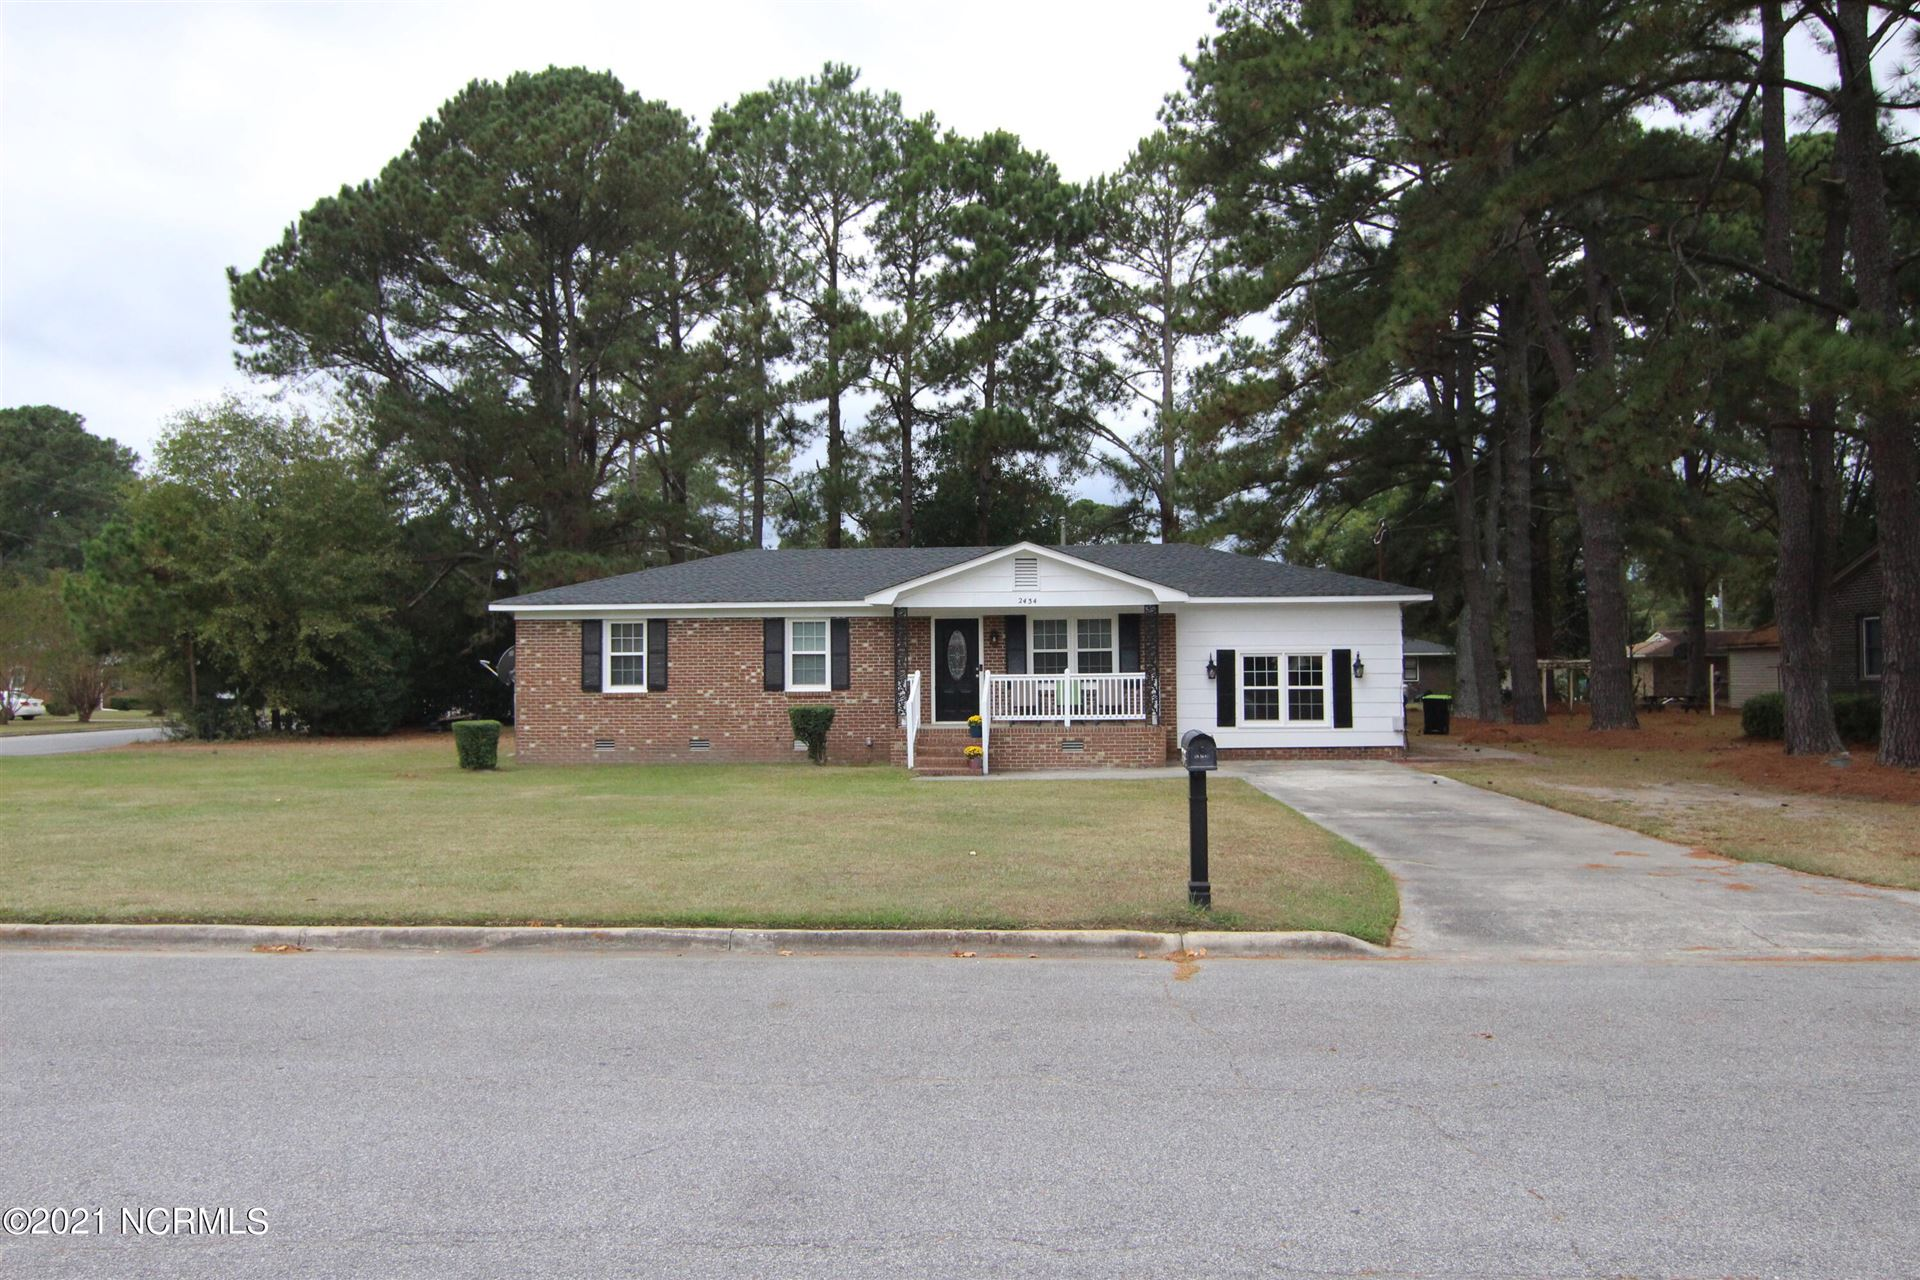 Photo of 2434 Glenda Street Street, Winterville, NC 28590 (MLS # 100296314)